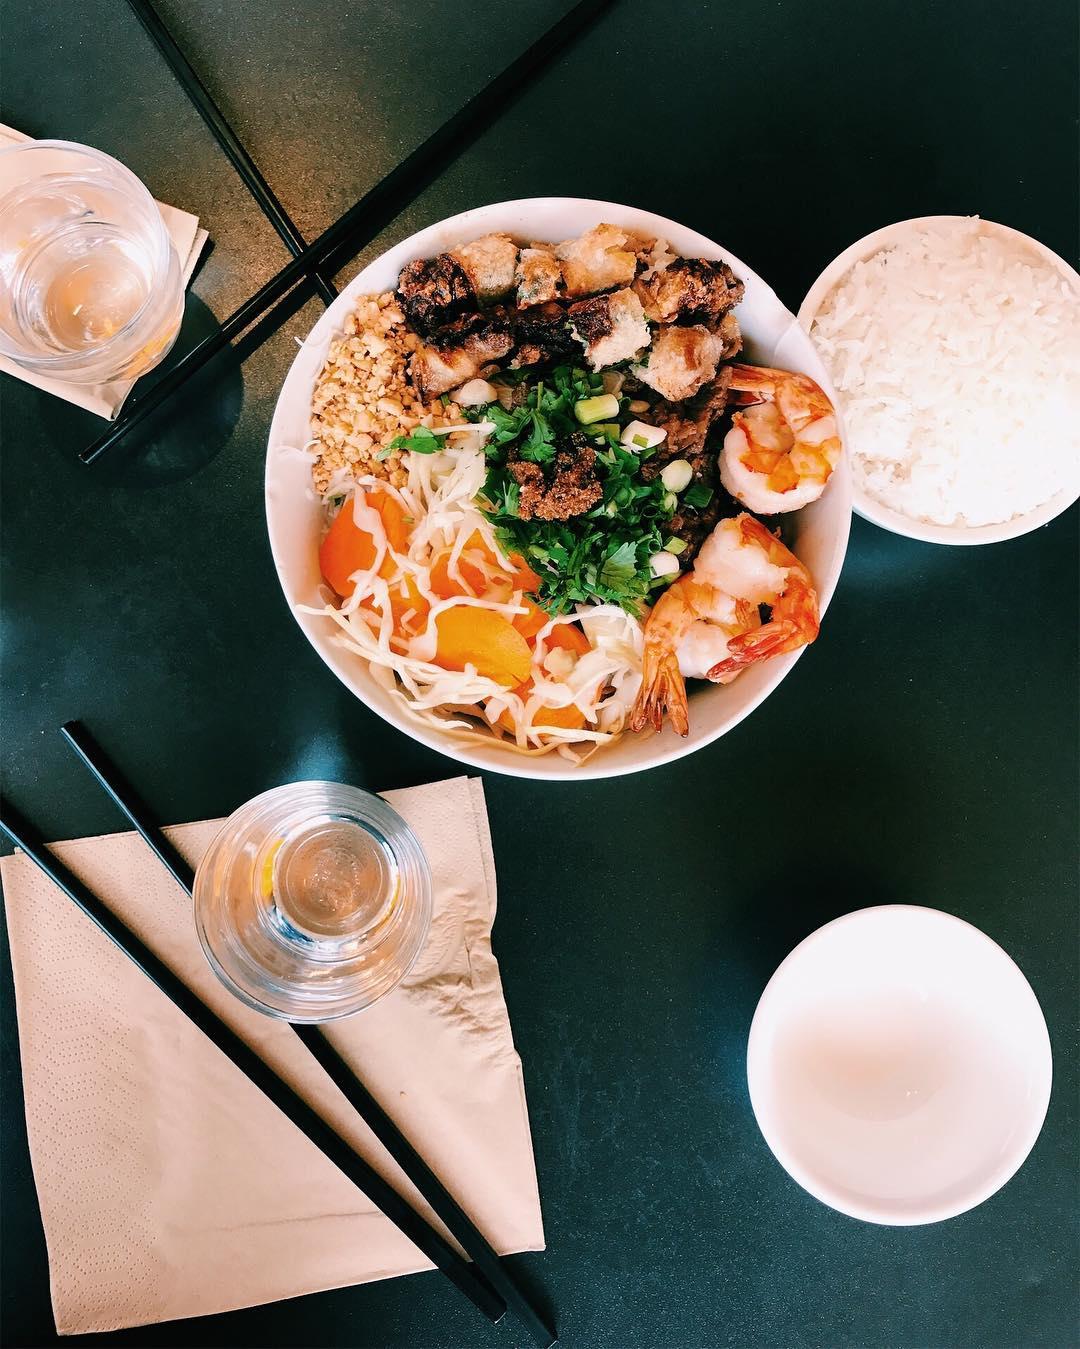 Cheap Eats in Paris - Le Petit Cambodge